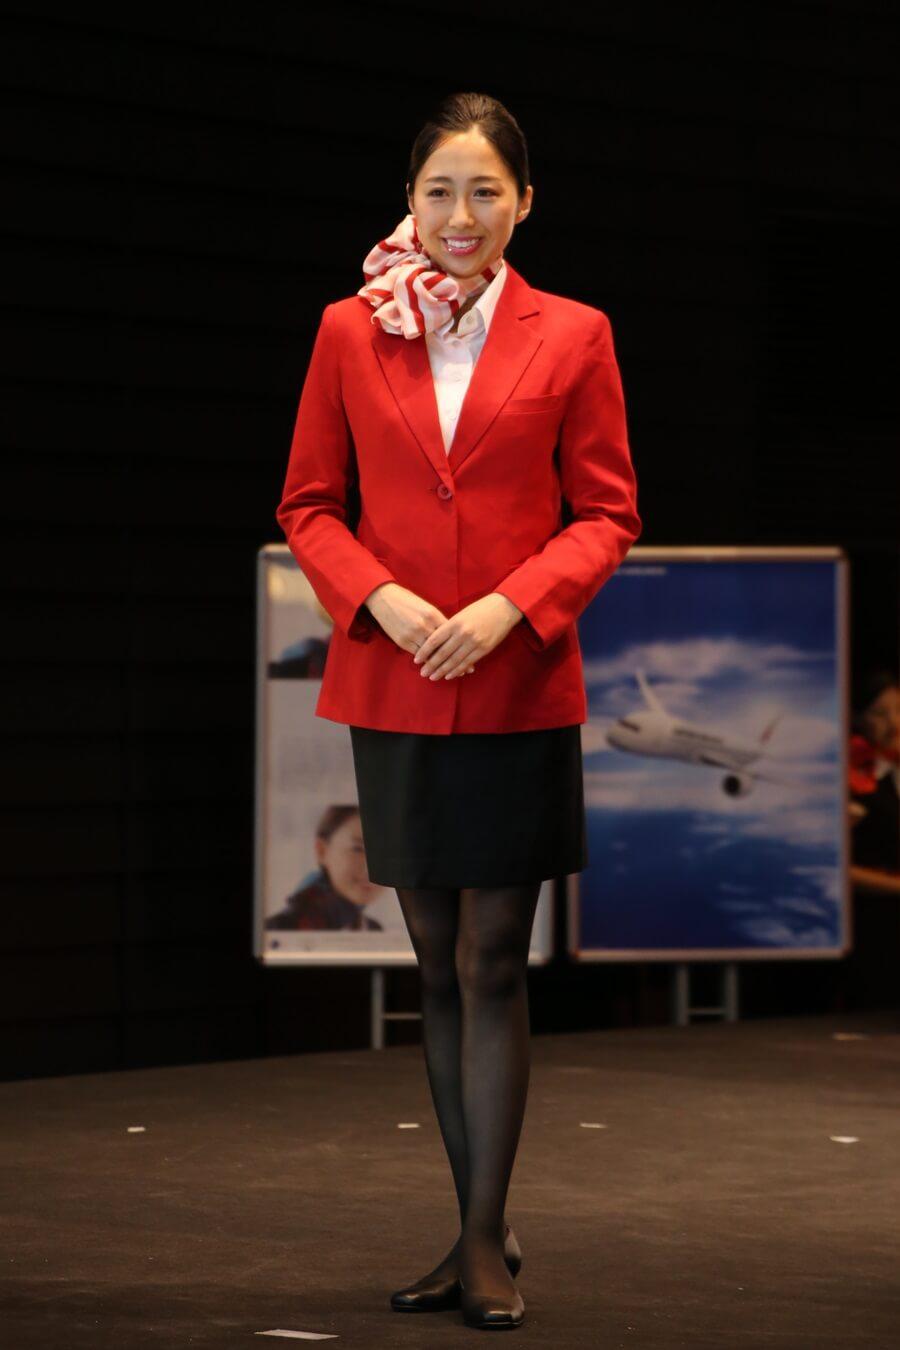 JEX初代制服 JALとJEX客室乗務員歴代制服ファッションショー 客室乗務員 スチワーデス 歴代ユニフォーム 制服 空の日フェスティバル JAL fashion show JAL Express JEX (1)